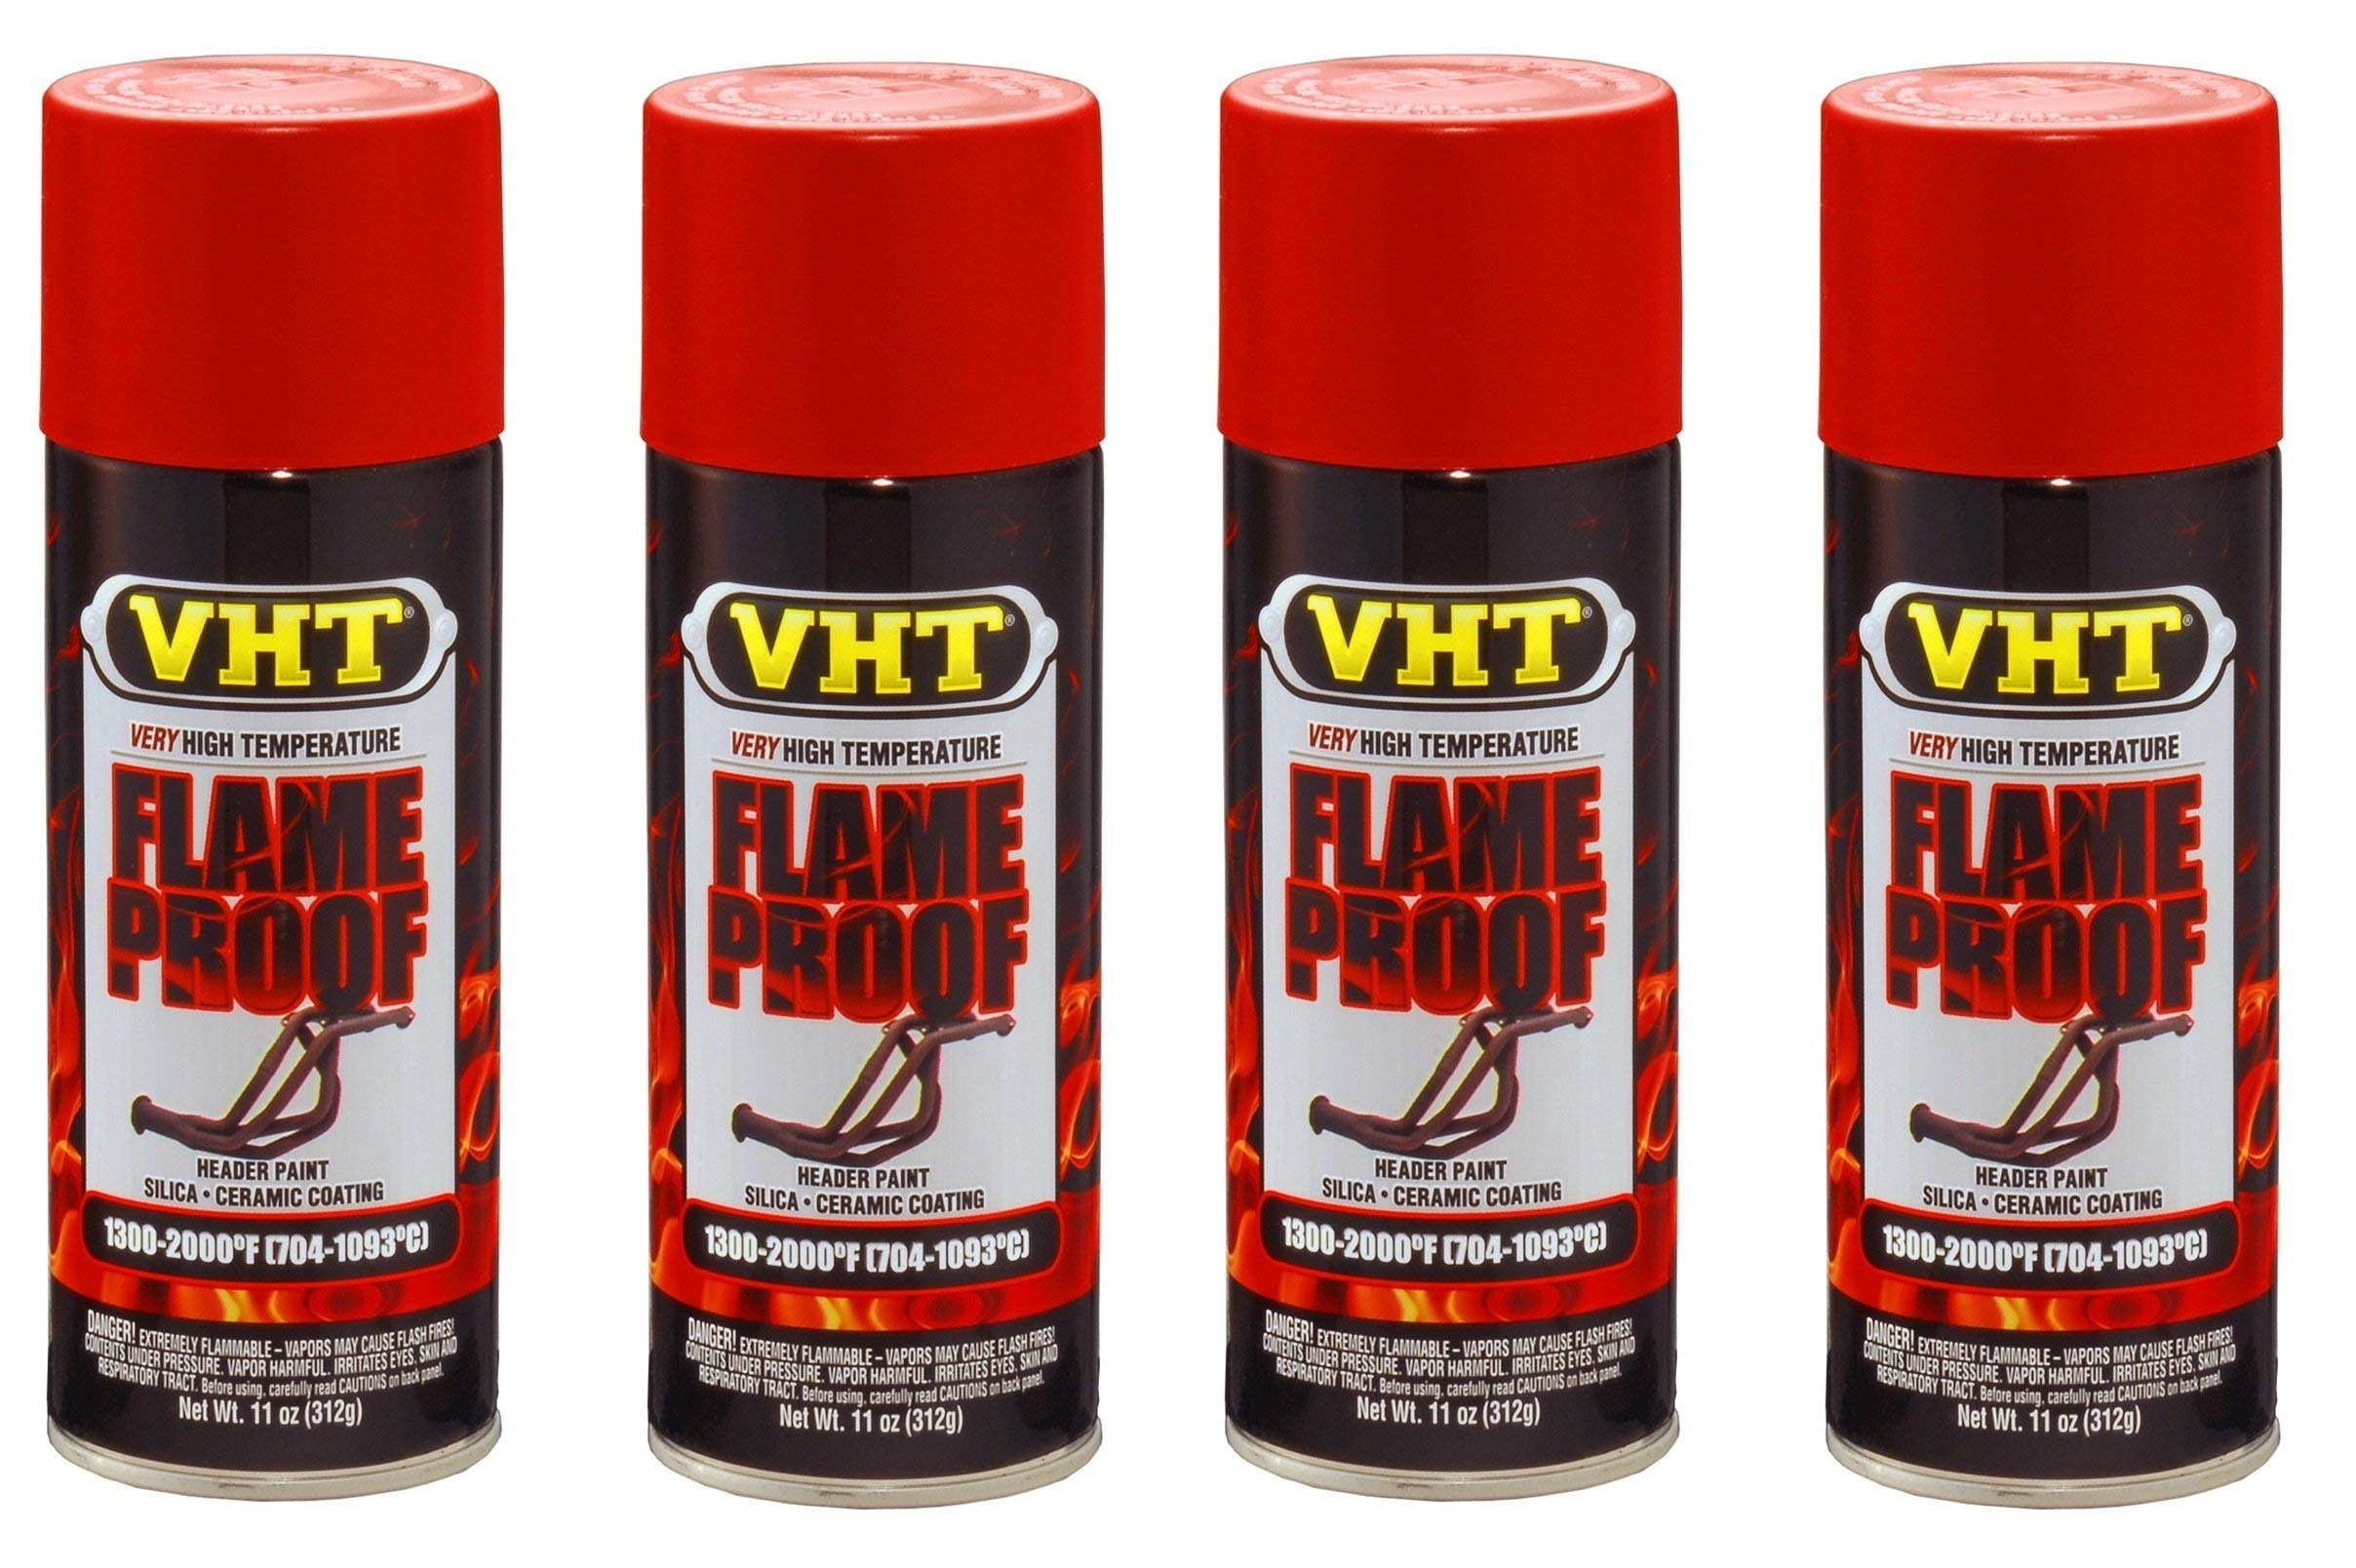 Vht Paint VHT SP109 Flameproof Coating (4)